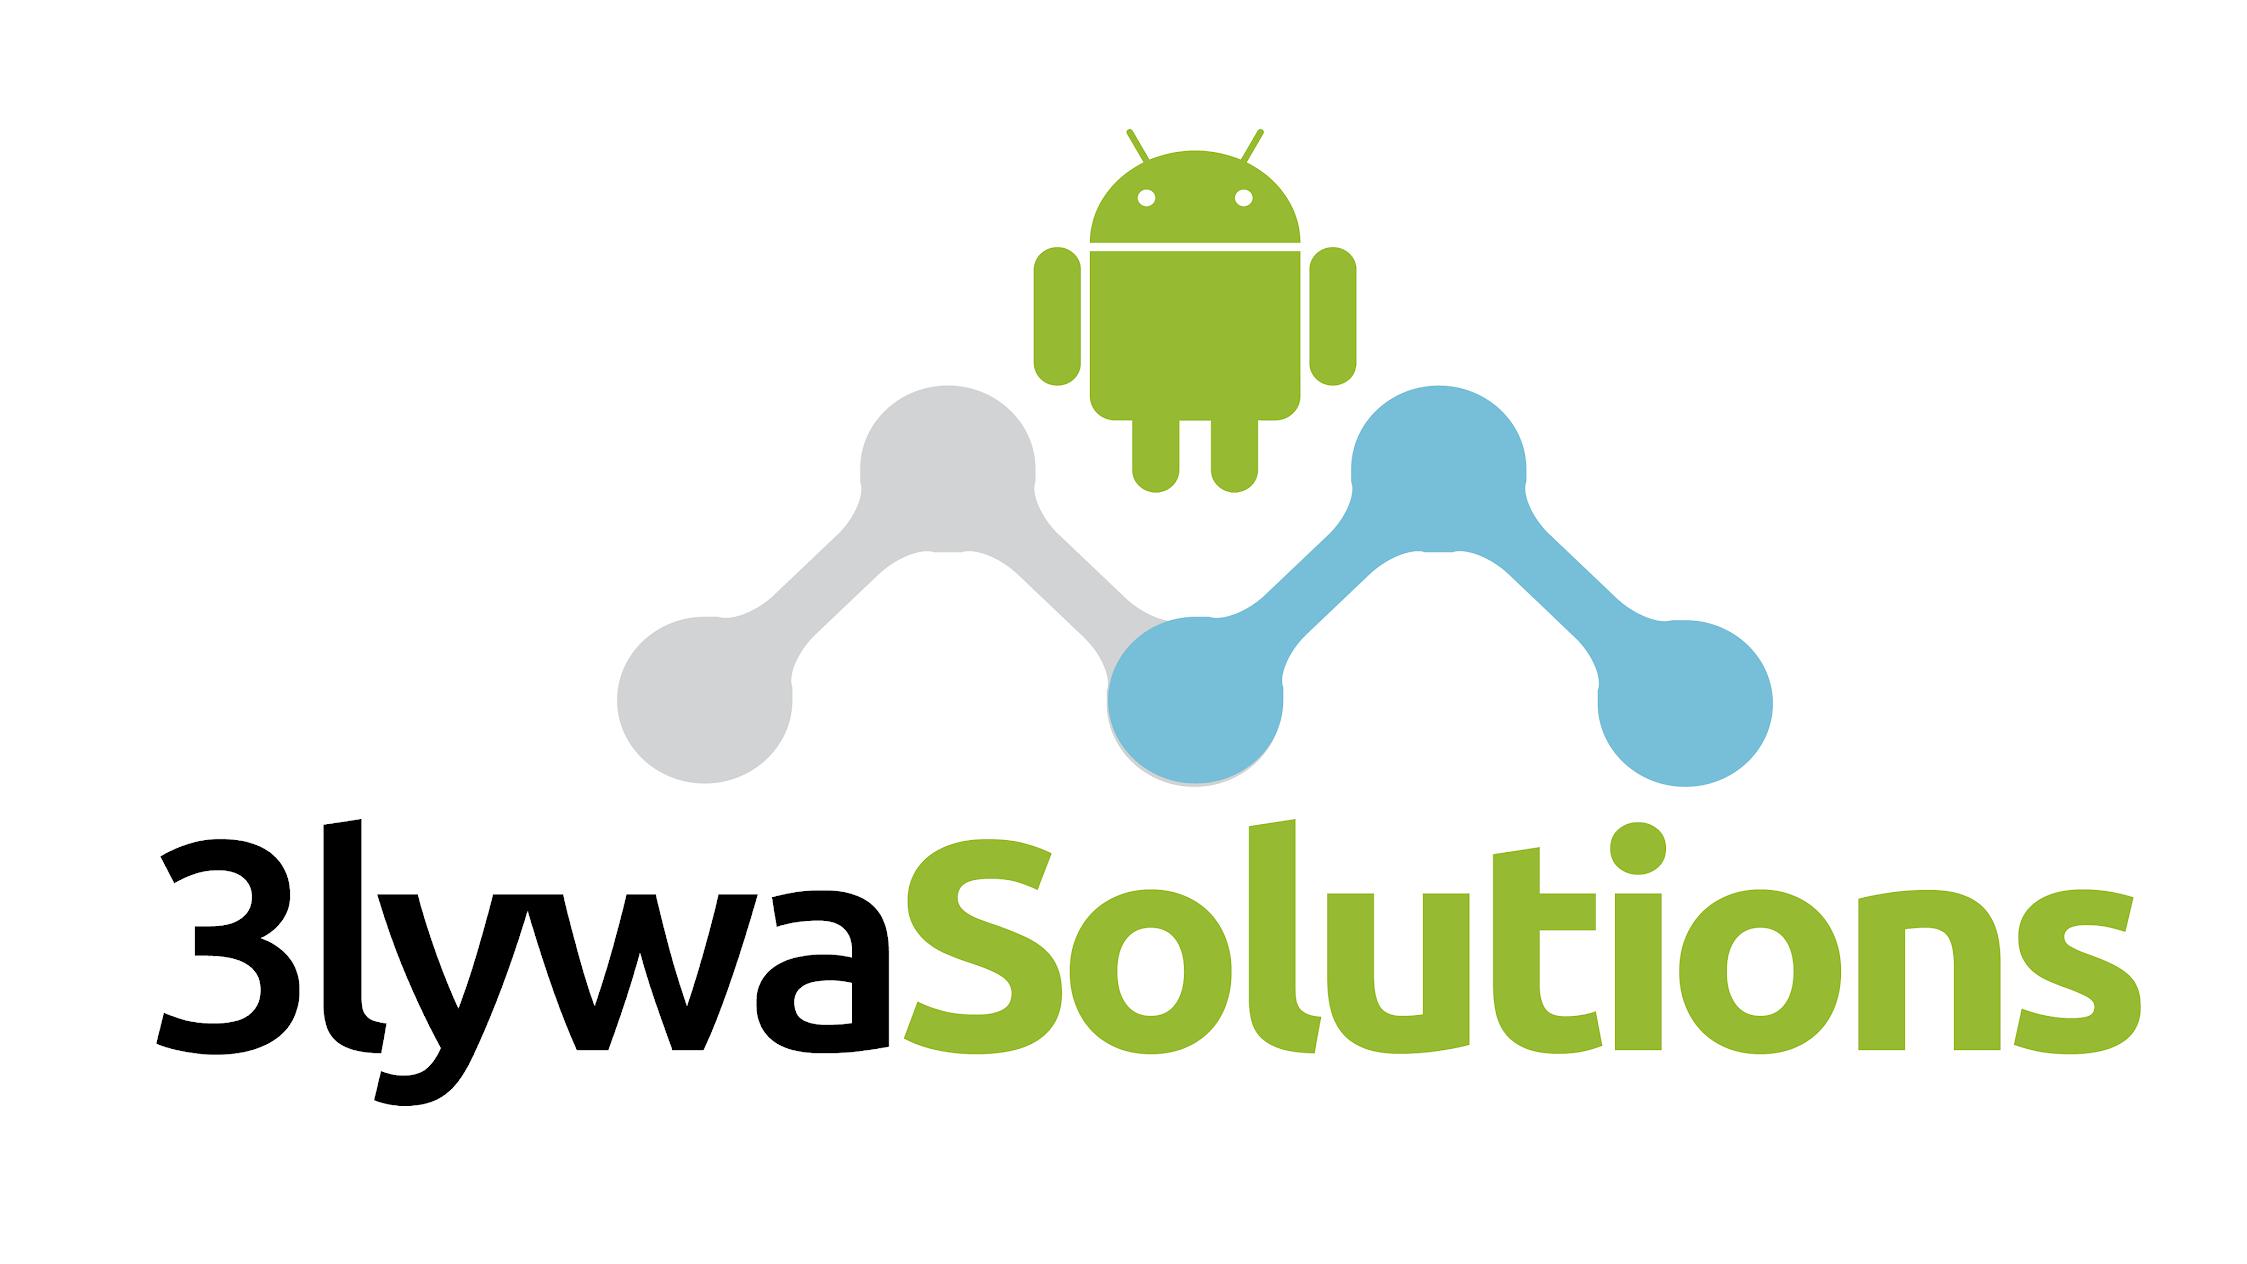 3lywa Solutions